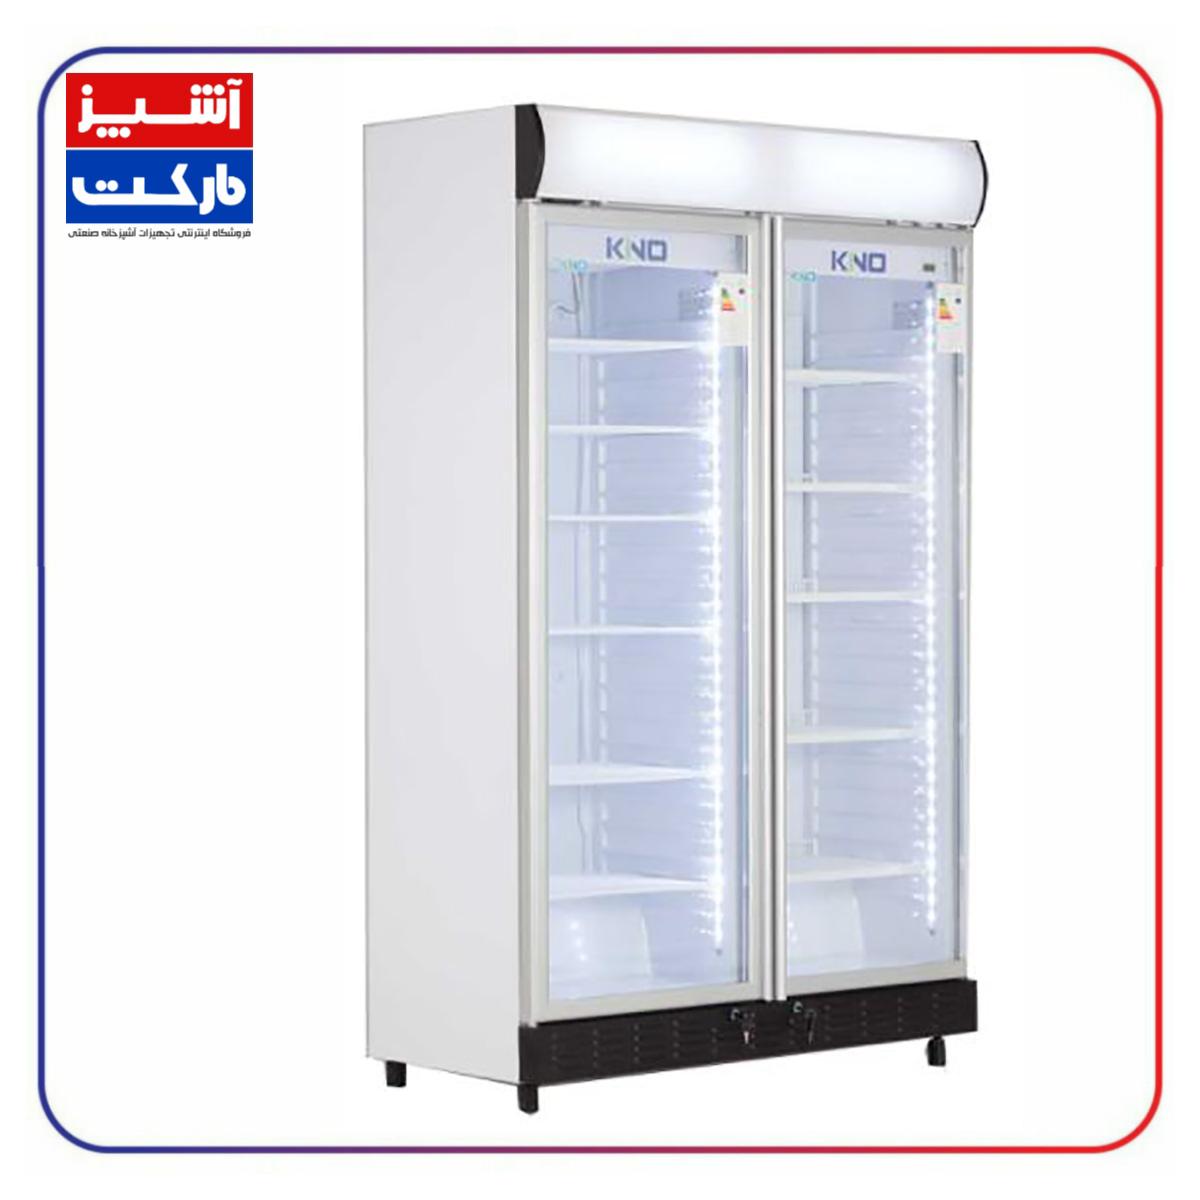 یخچال + یخچال ساید کینو KINO KRR